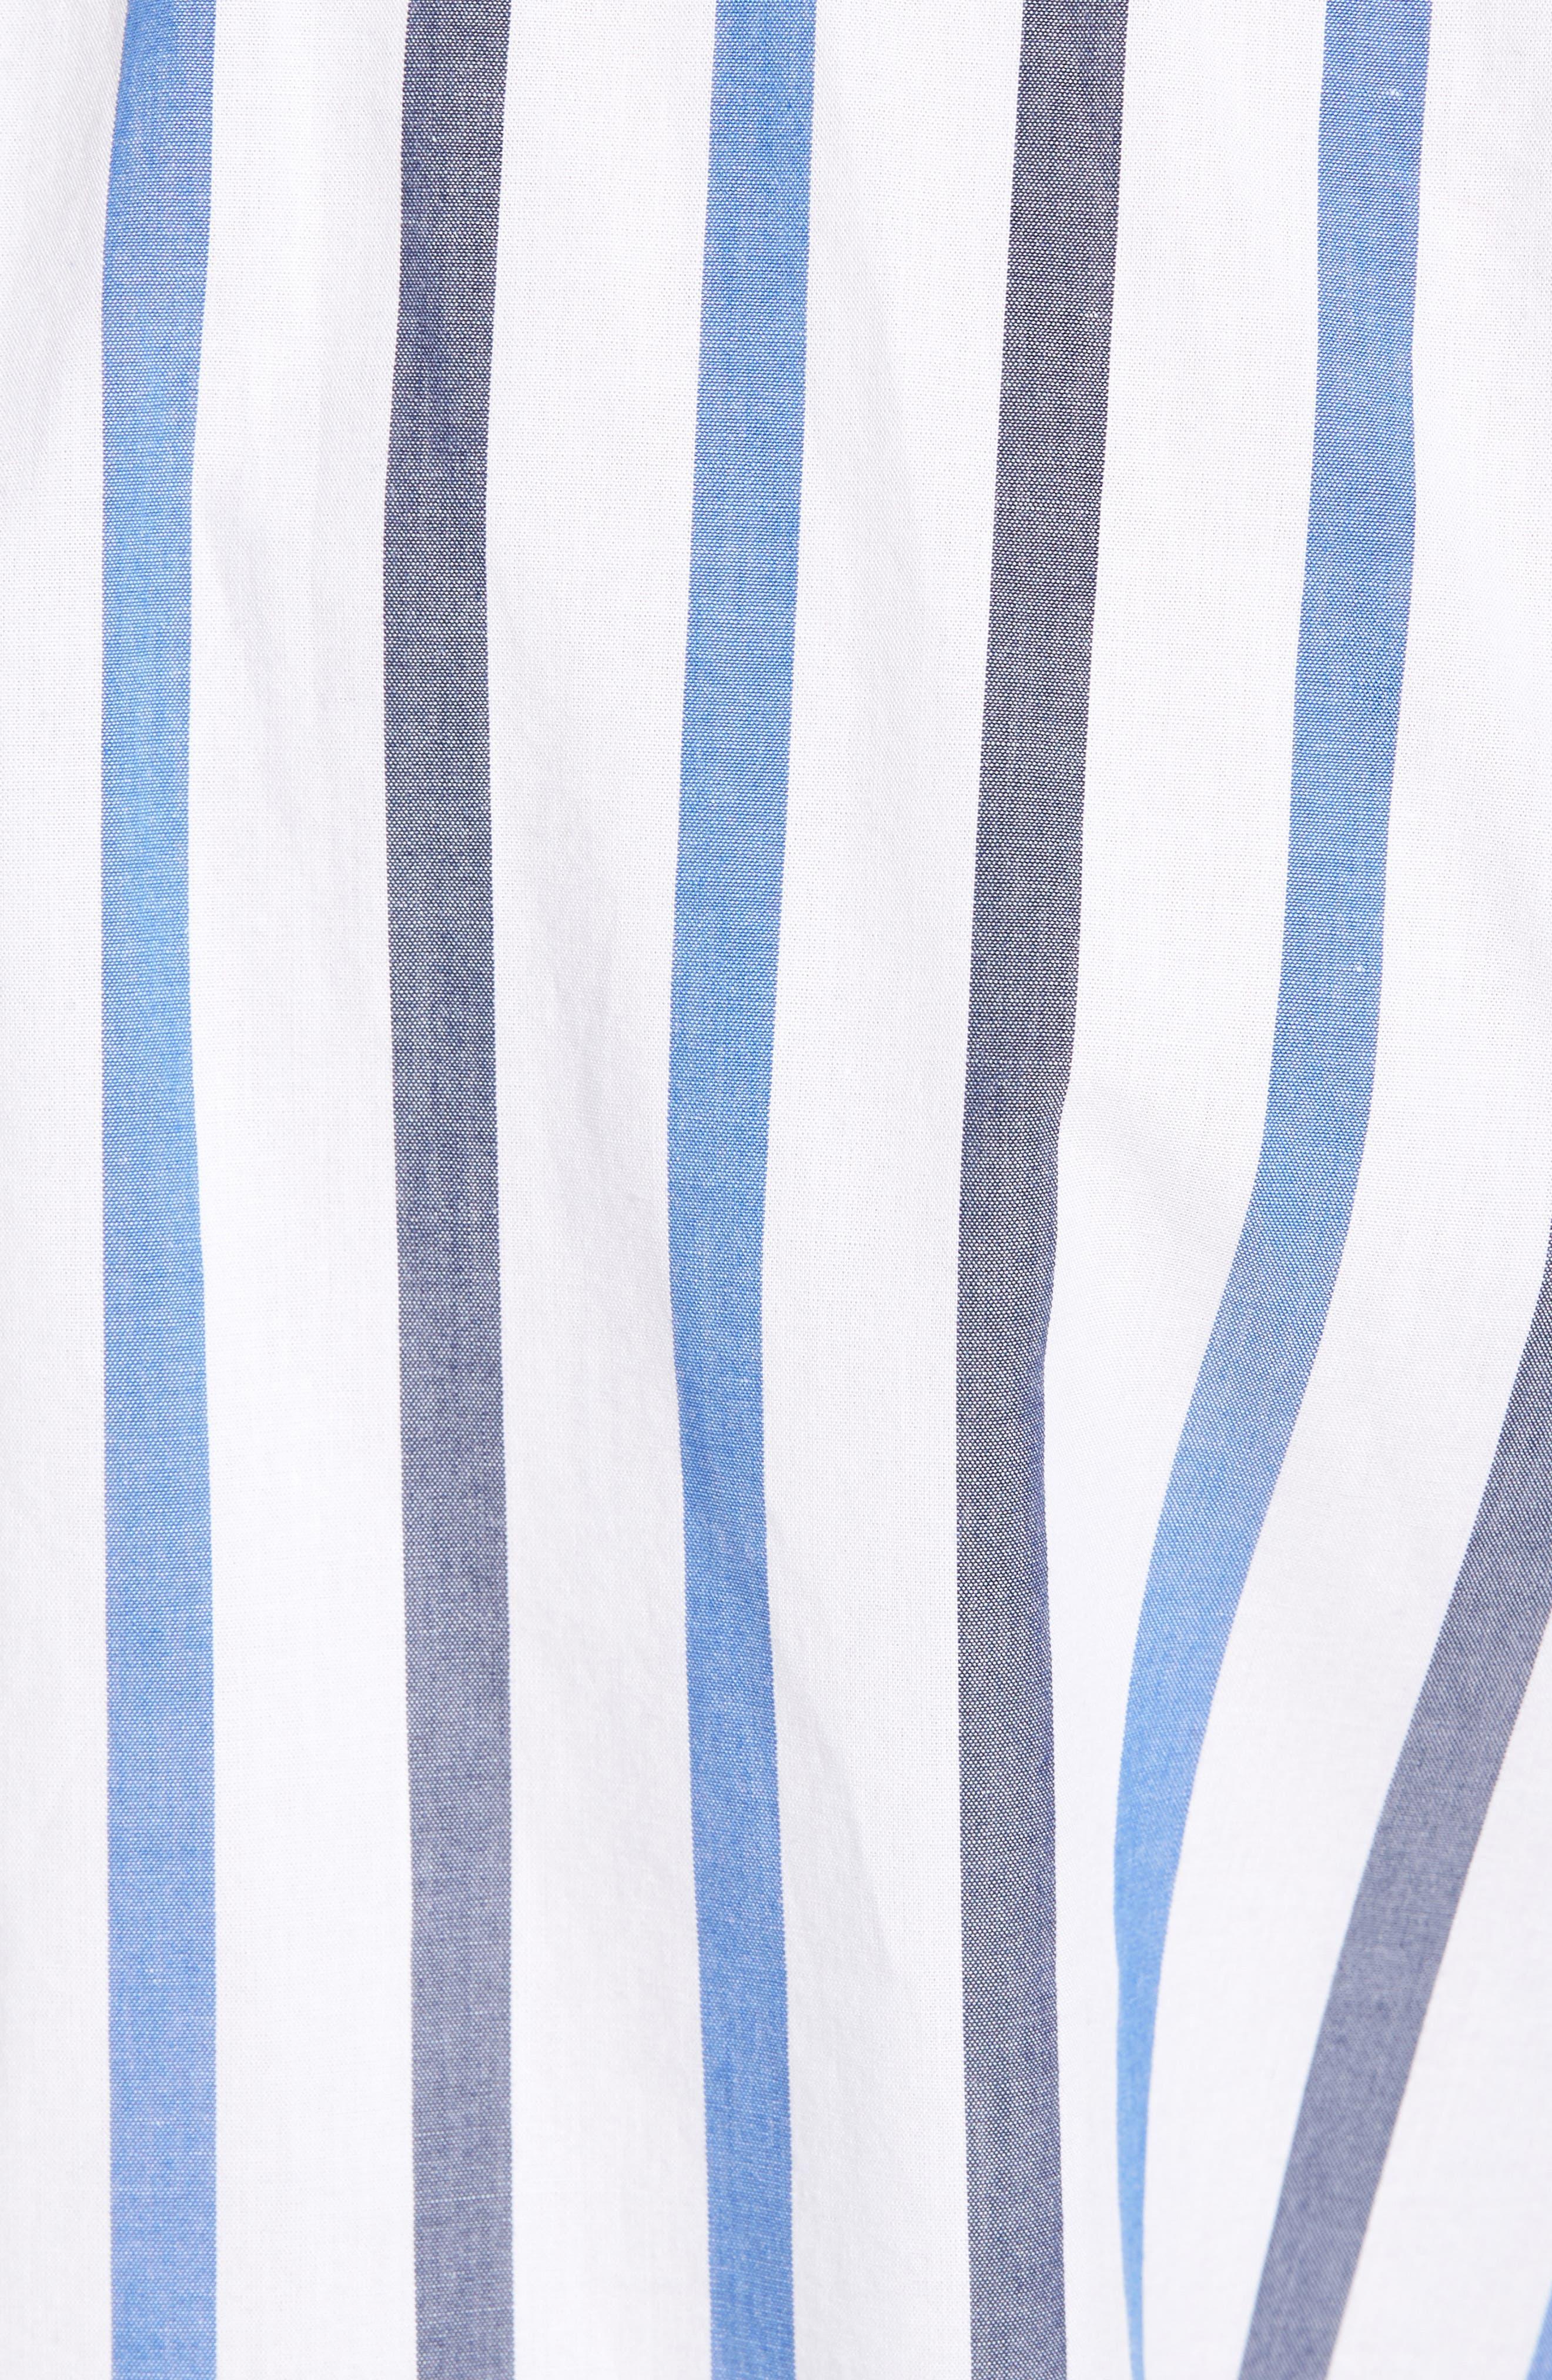 Trim Fit Stripe Stretch Sport Shirt,                             Alternate thumbnail 5, color,                             White Blue Stripe